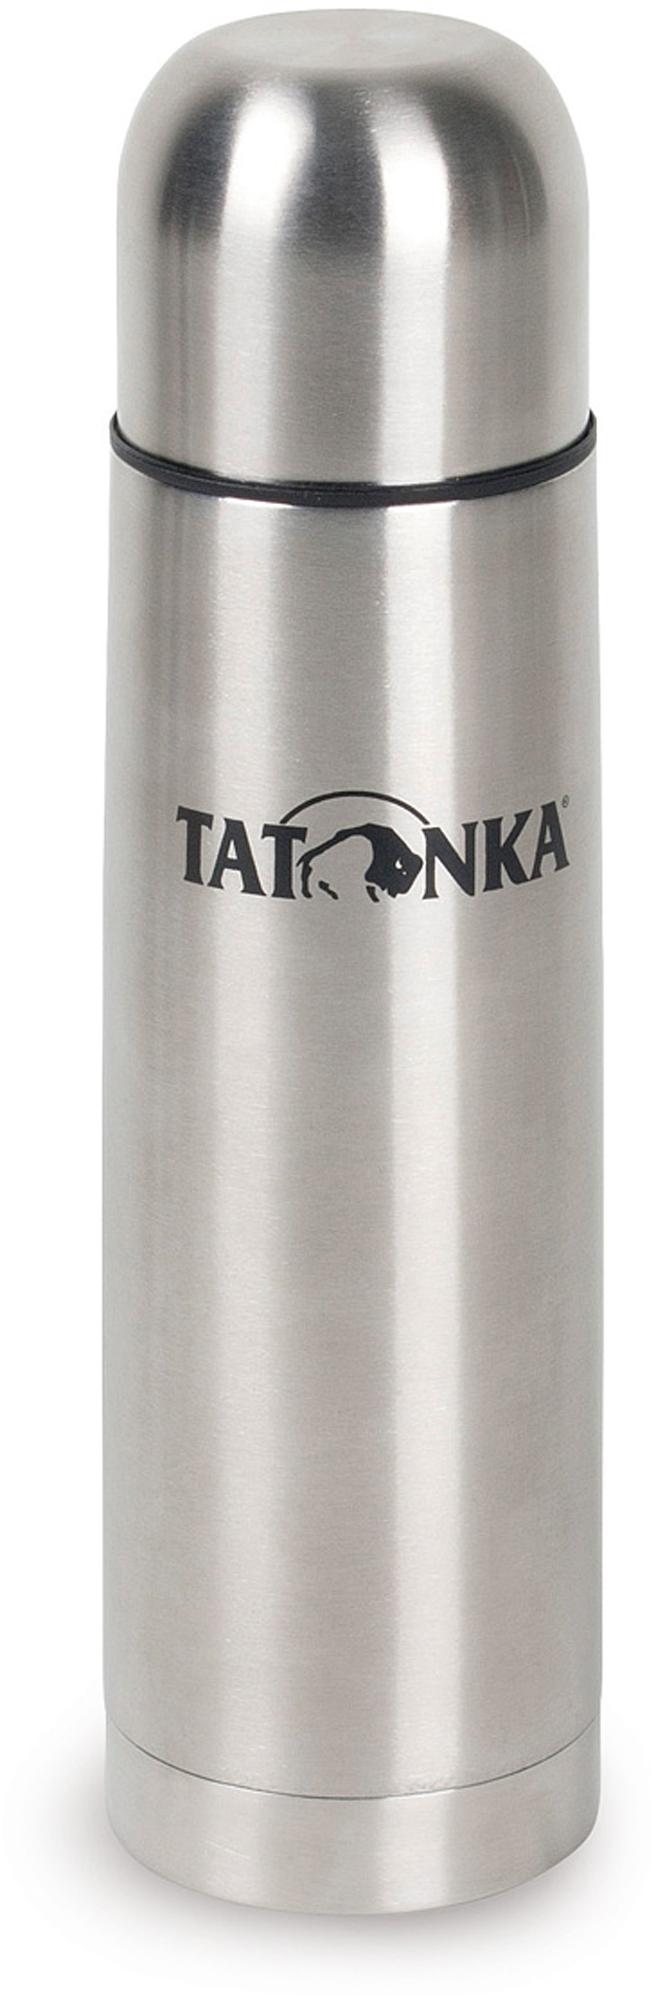 цена на Tatonka Термос Tatonka 0,45 л